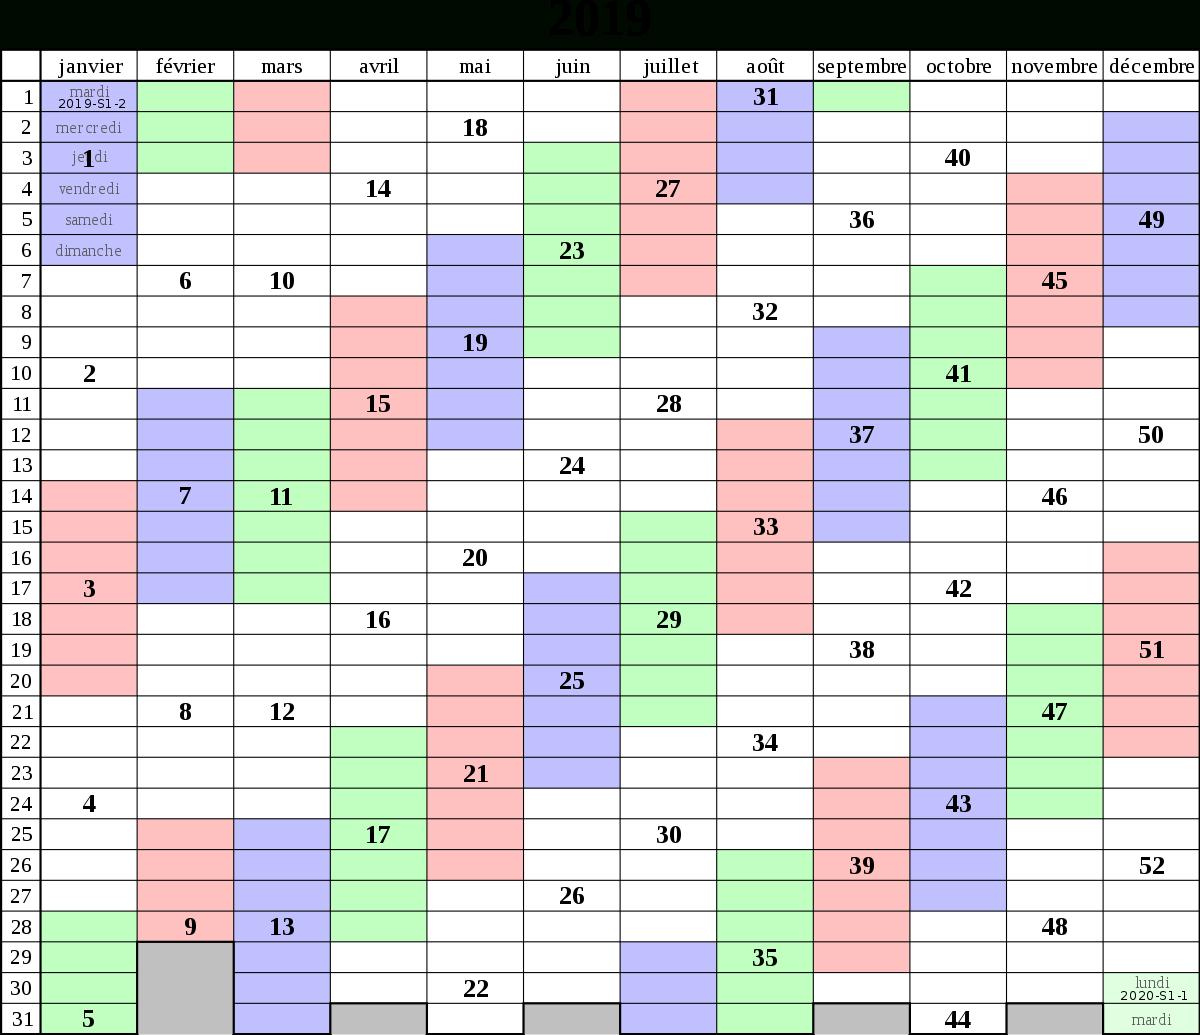 Fichier:calendrier 2019 Semaines Iso Fr.svg — Wikipédia encequiconcerne Calendrier 2019 Avec Semaine